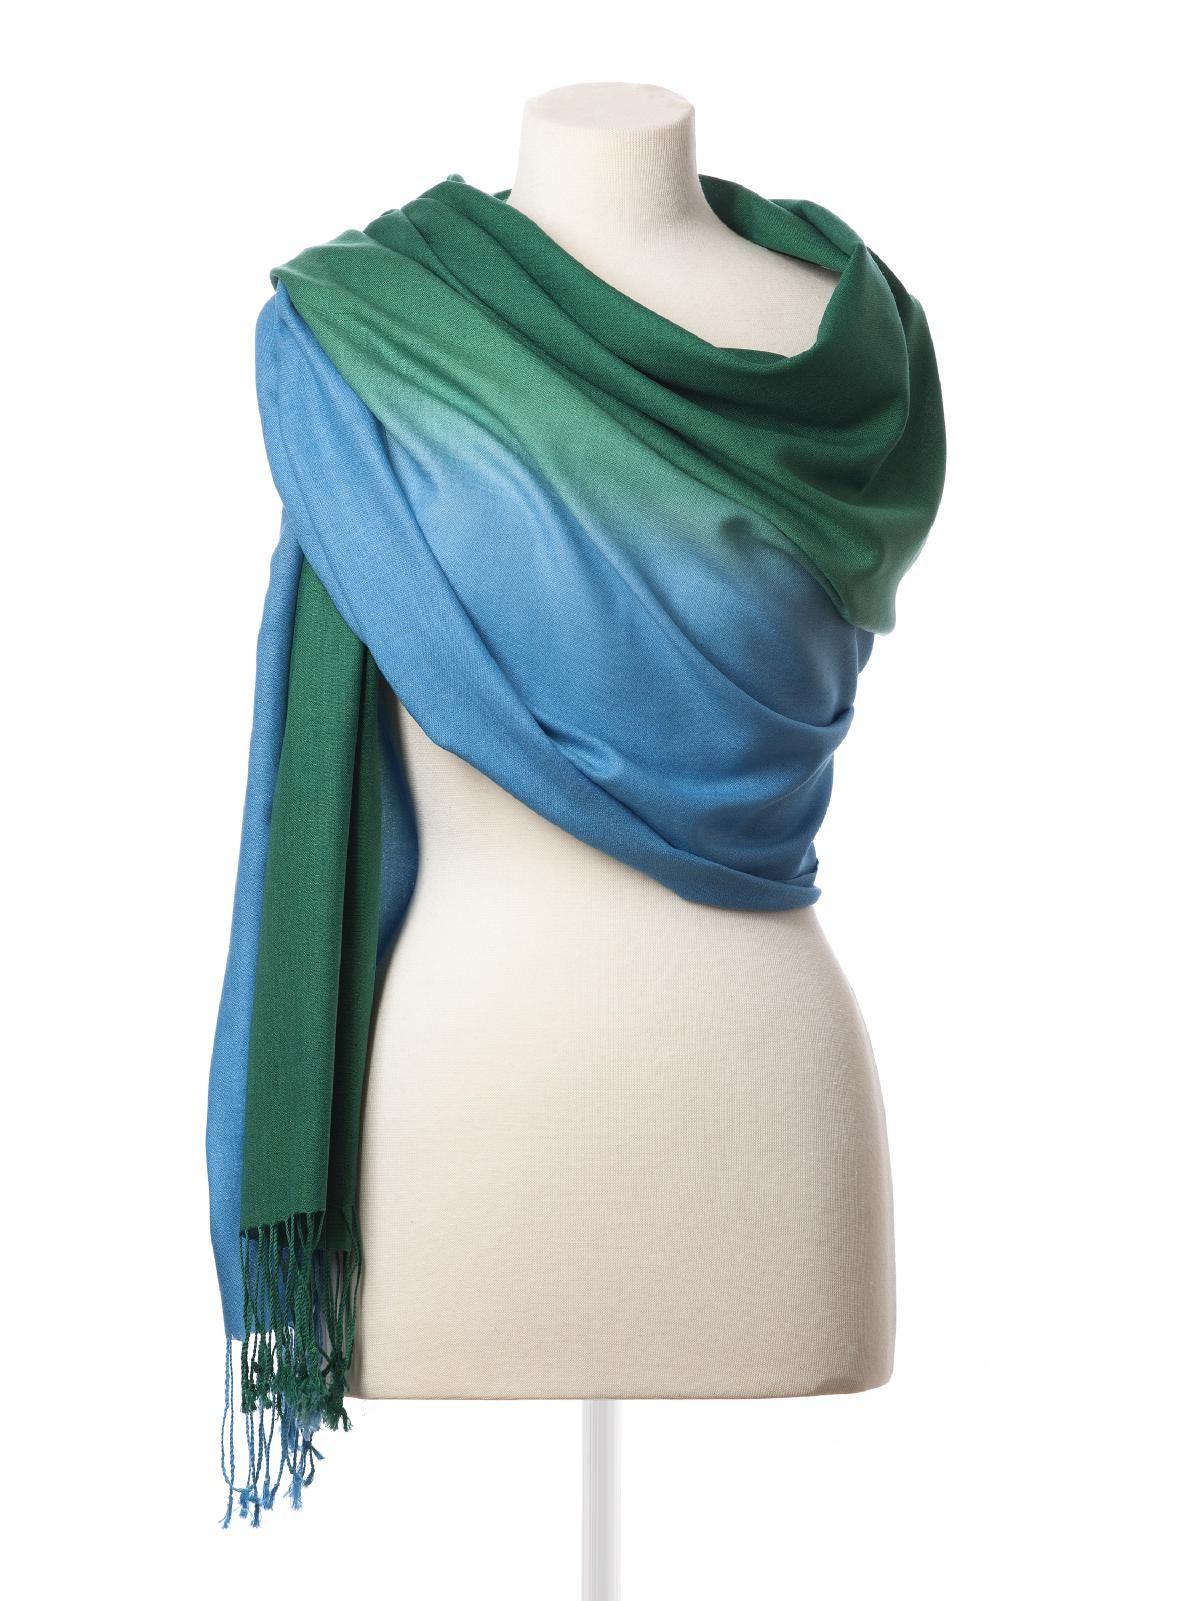 Ombre scarf  #dessy♥weddingchicks